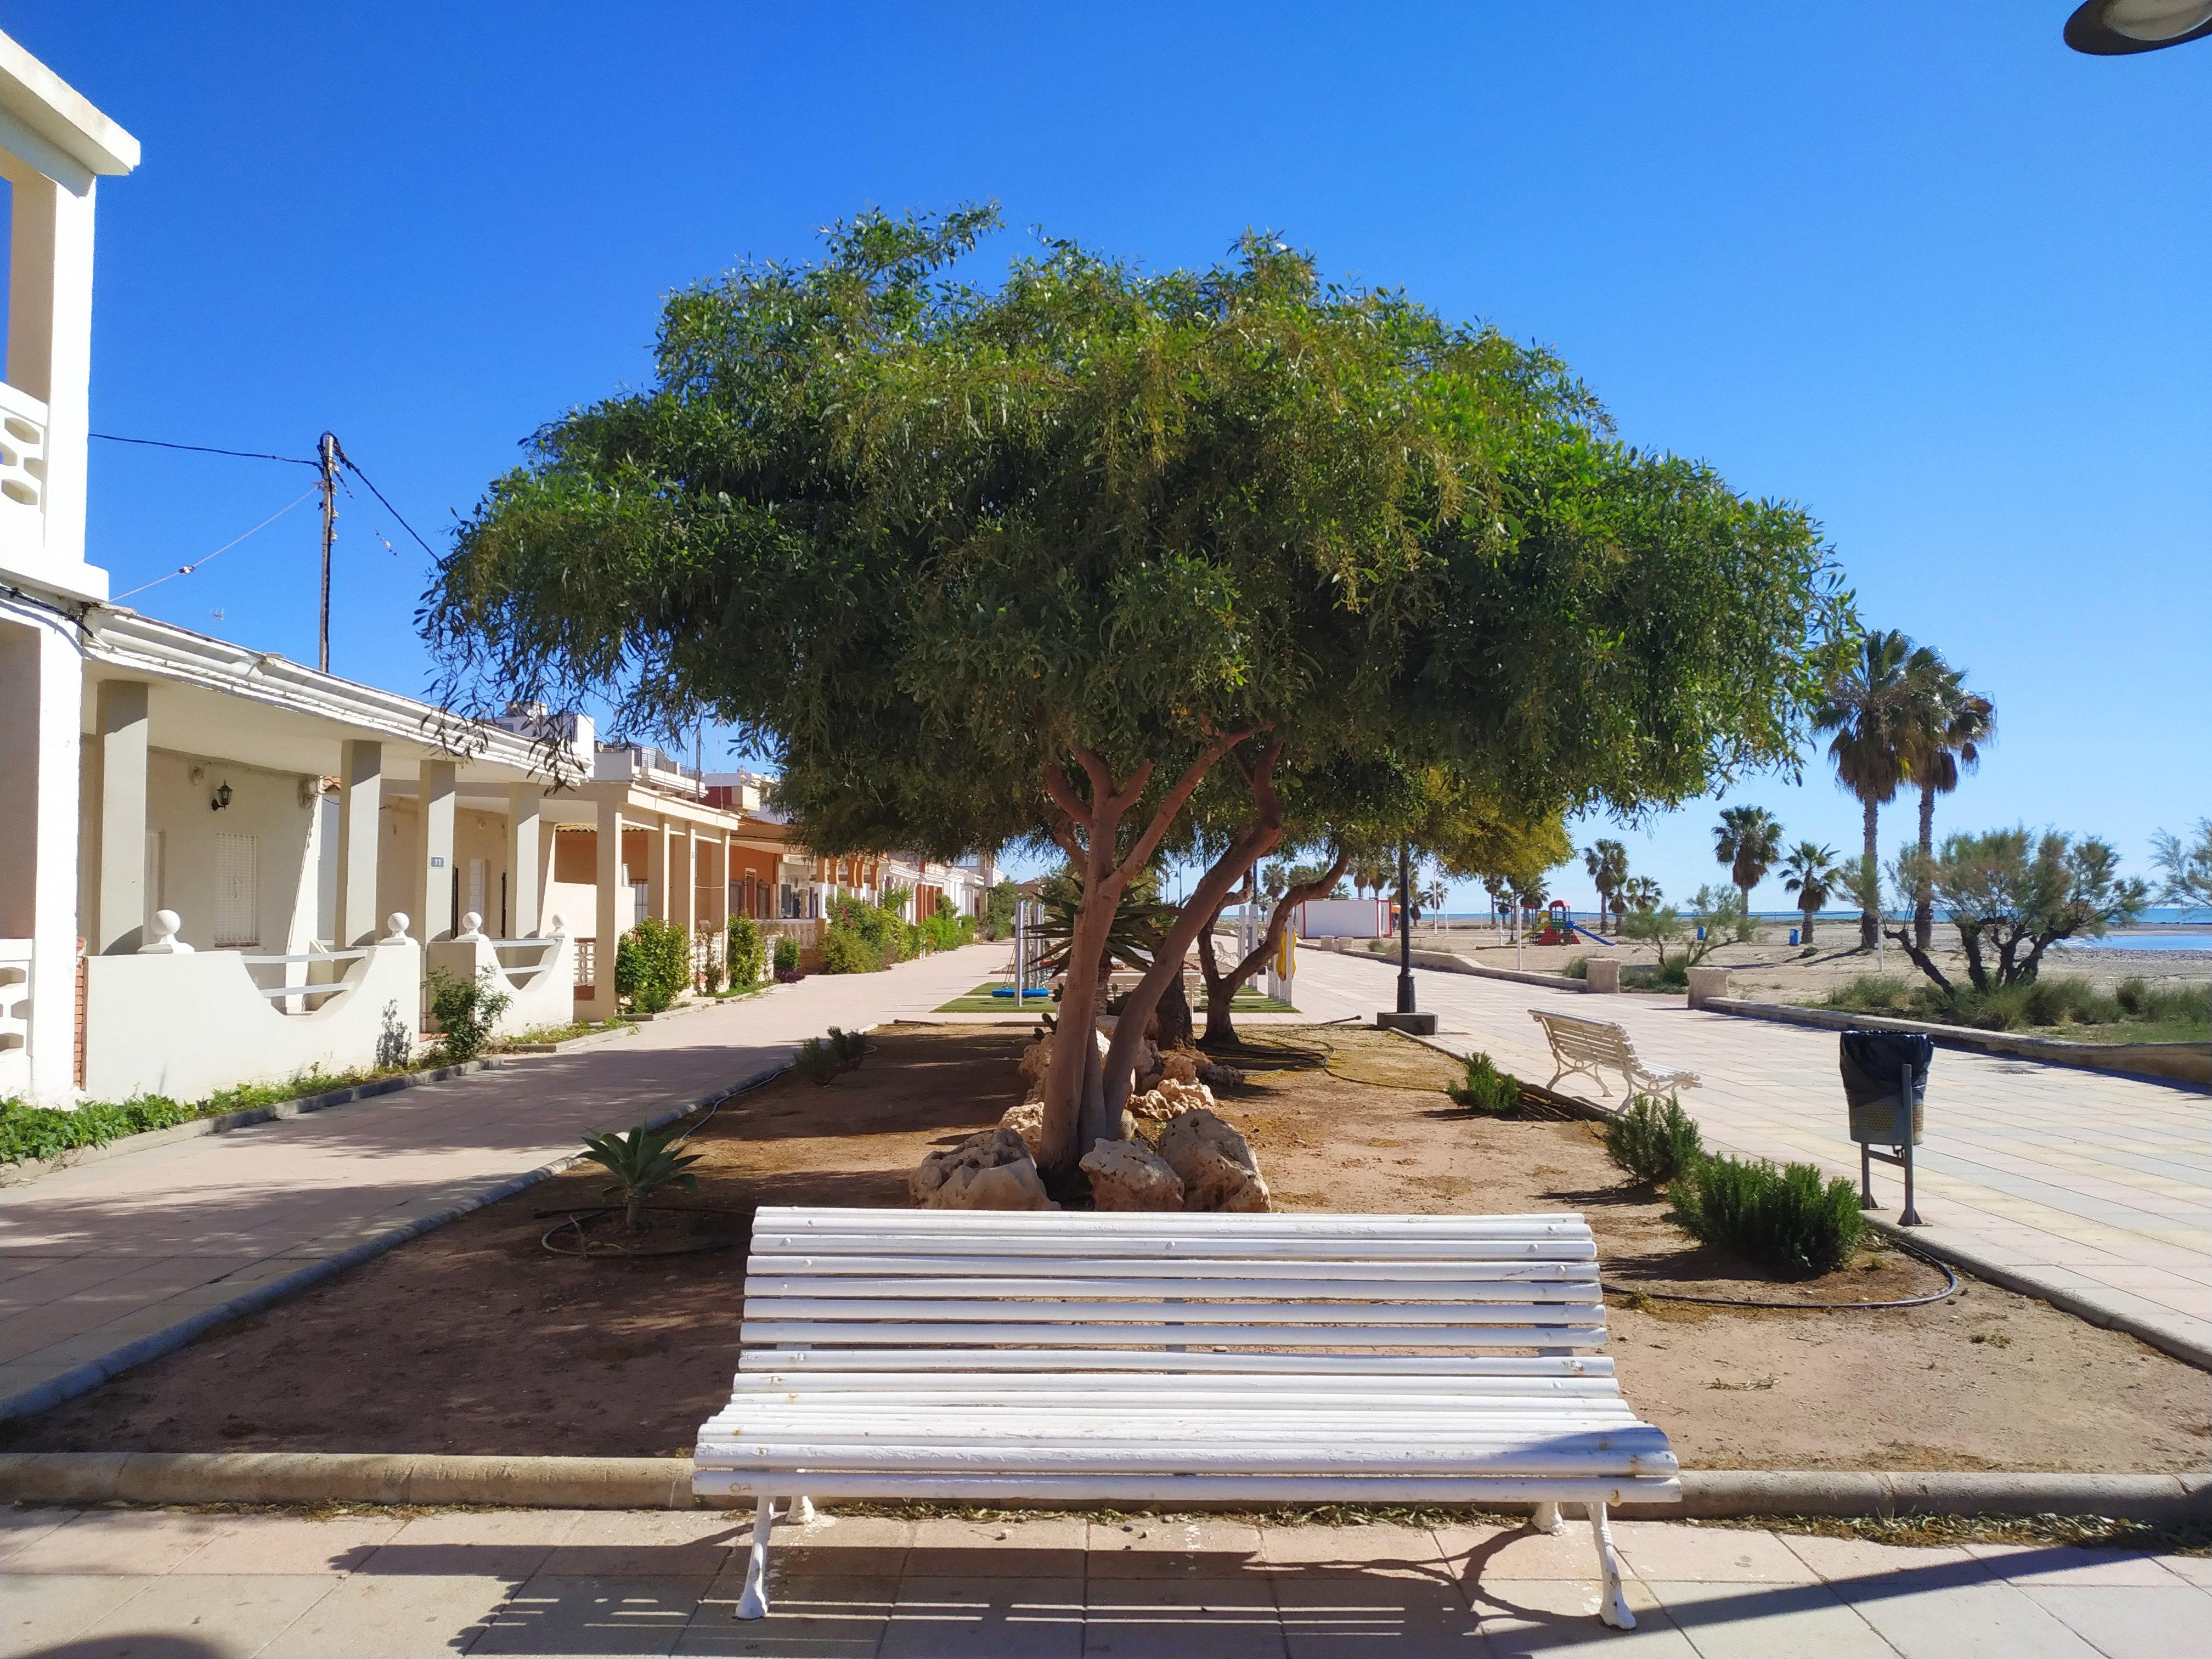 Strandpromenade von Chilches